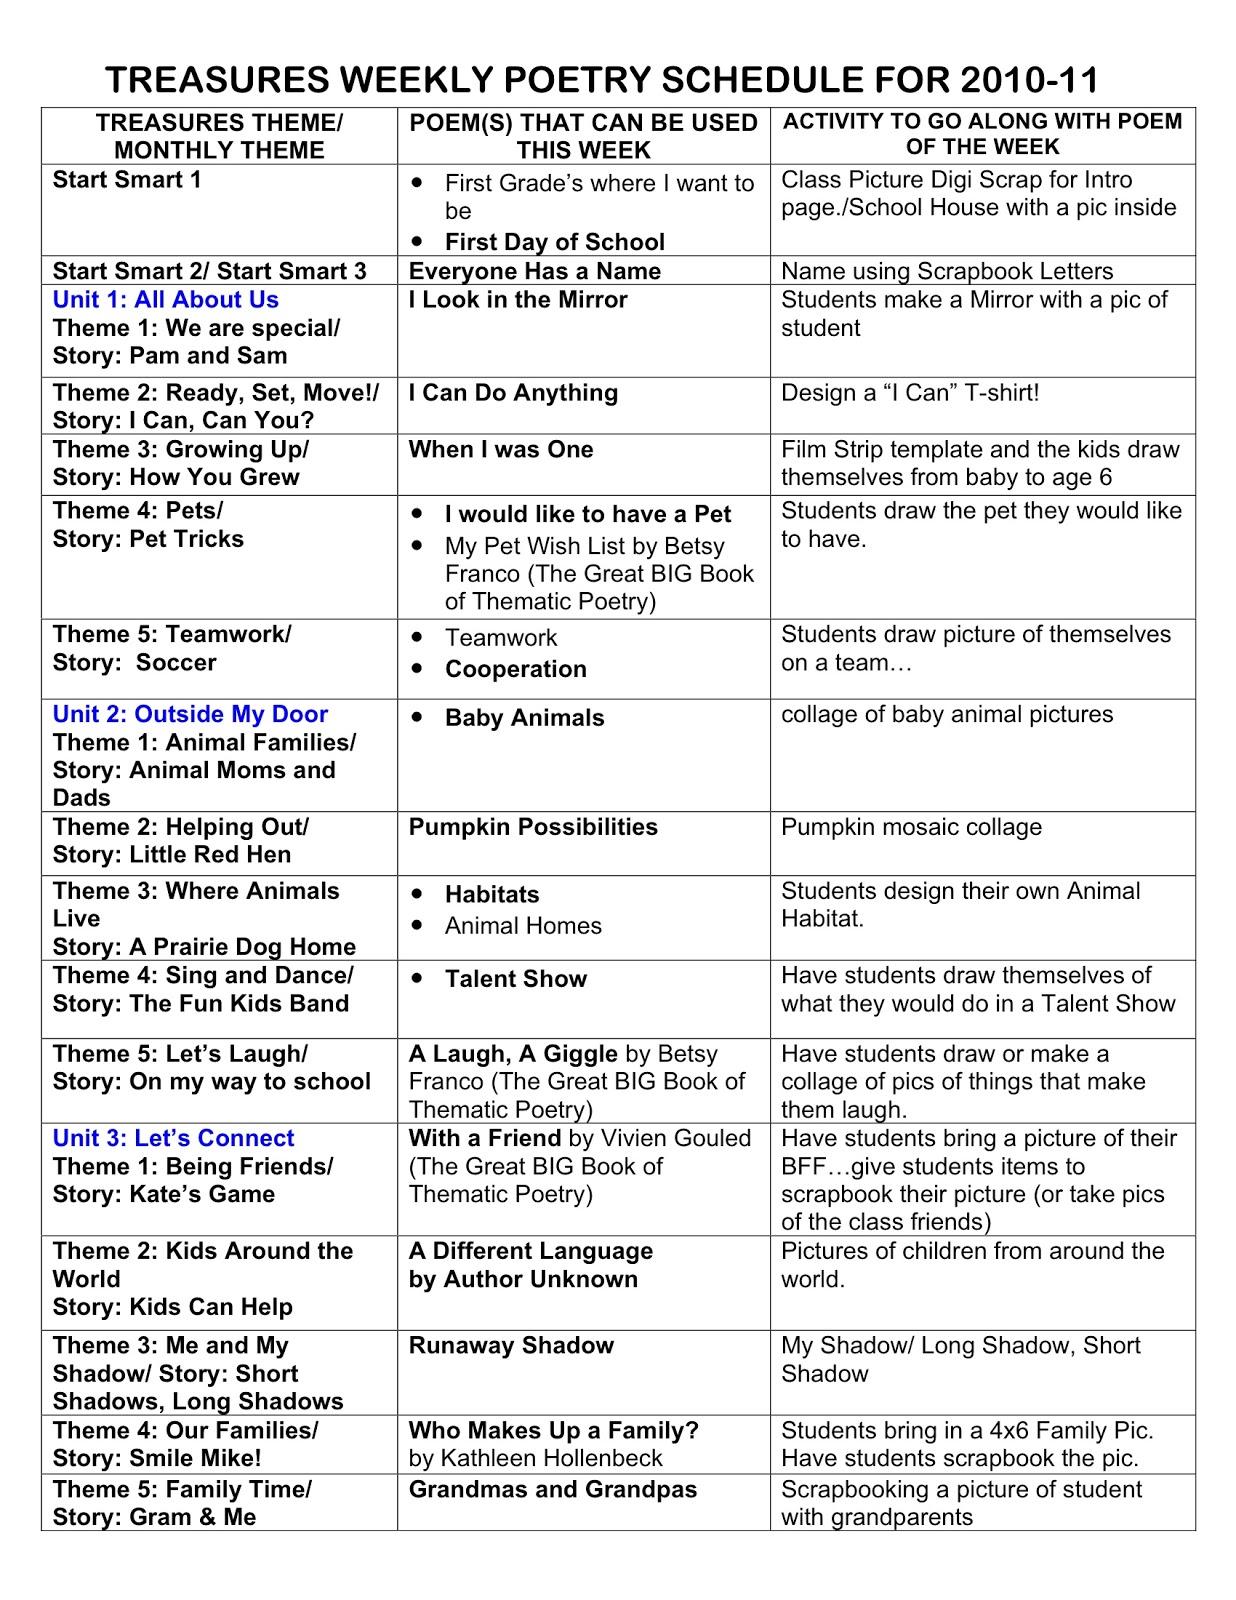 Just 4 Teachers Sharing Across Borders 1st Grade Poems Treasures Weekly Poetry Schedule For